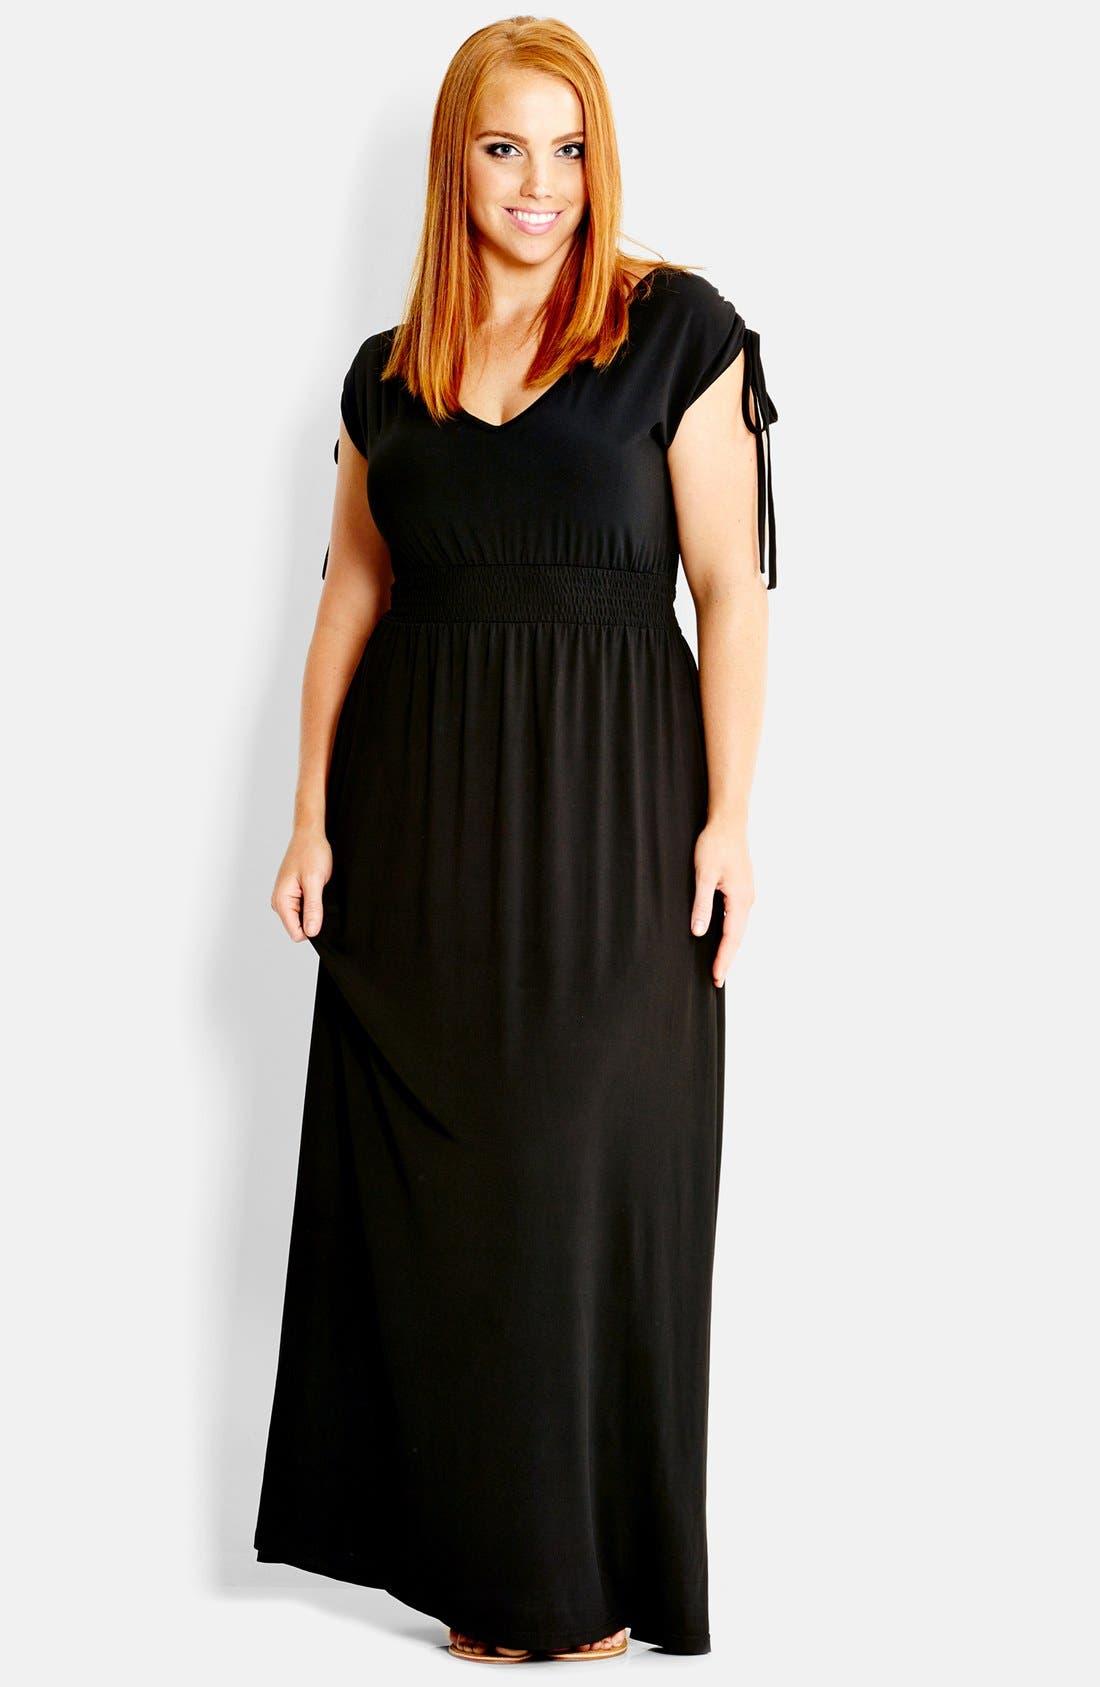 Alternate Image 1 Selected - City Chic 'Drapey' V-Neck Maxi Dress (Plus Size)